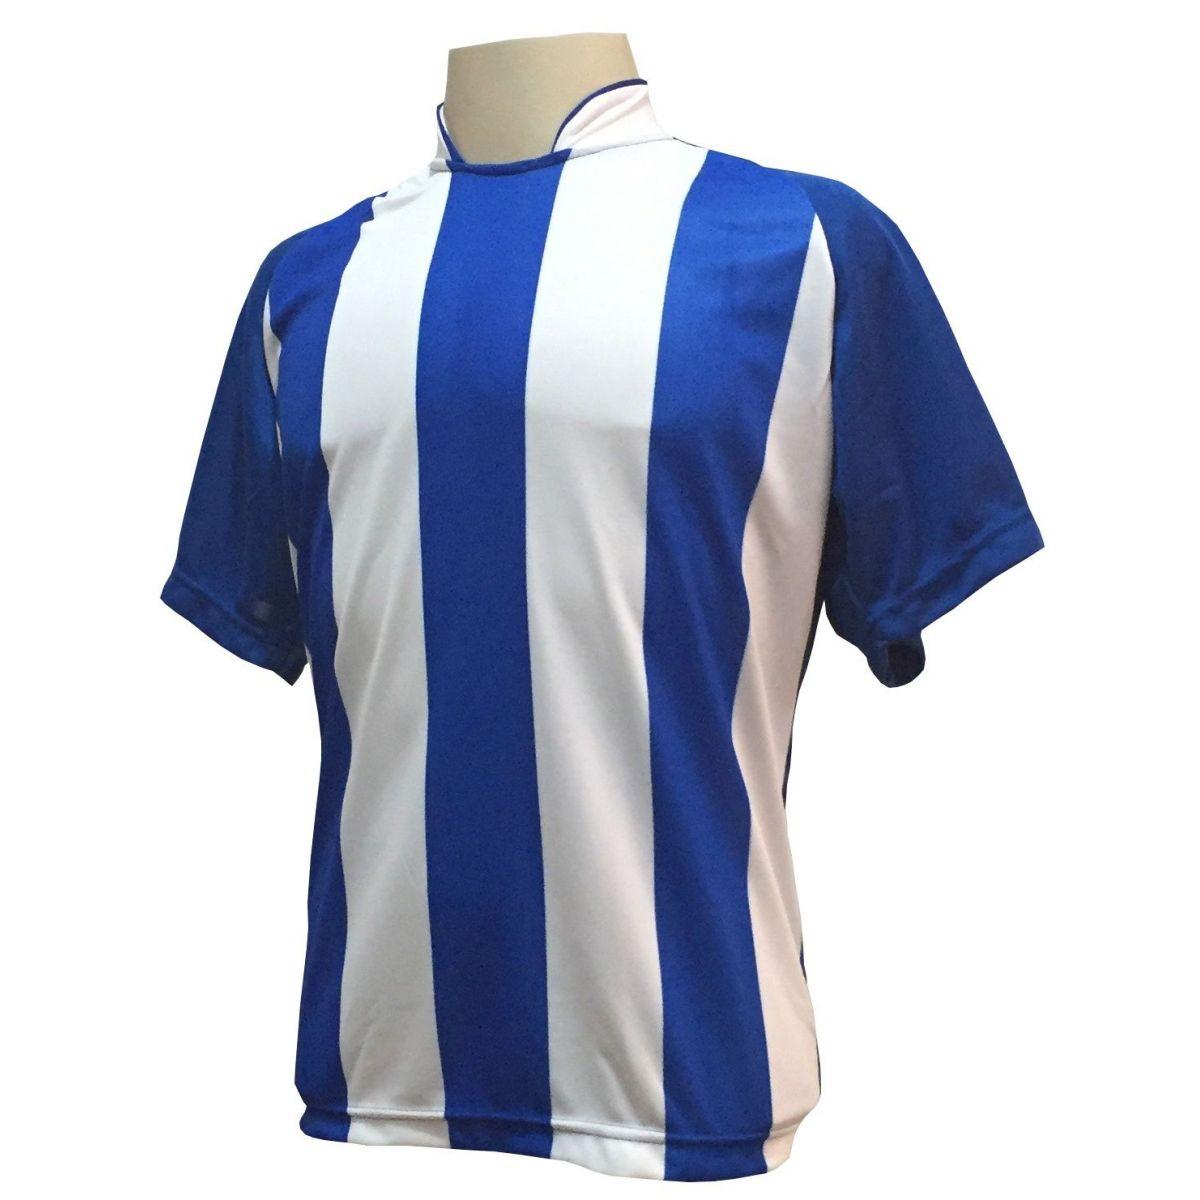 Uniforme Esportivo com 18 Camisas modelo Milan Royal/Branco + 18 Calções modelo Copa Royal/Branco